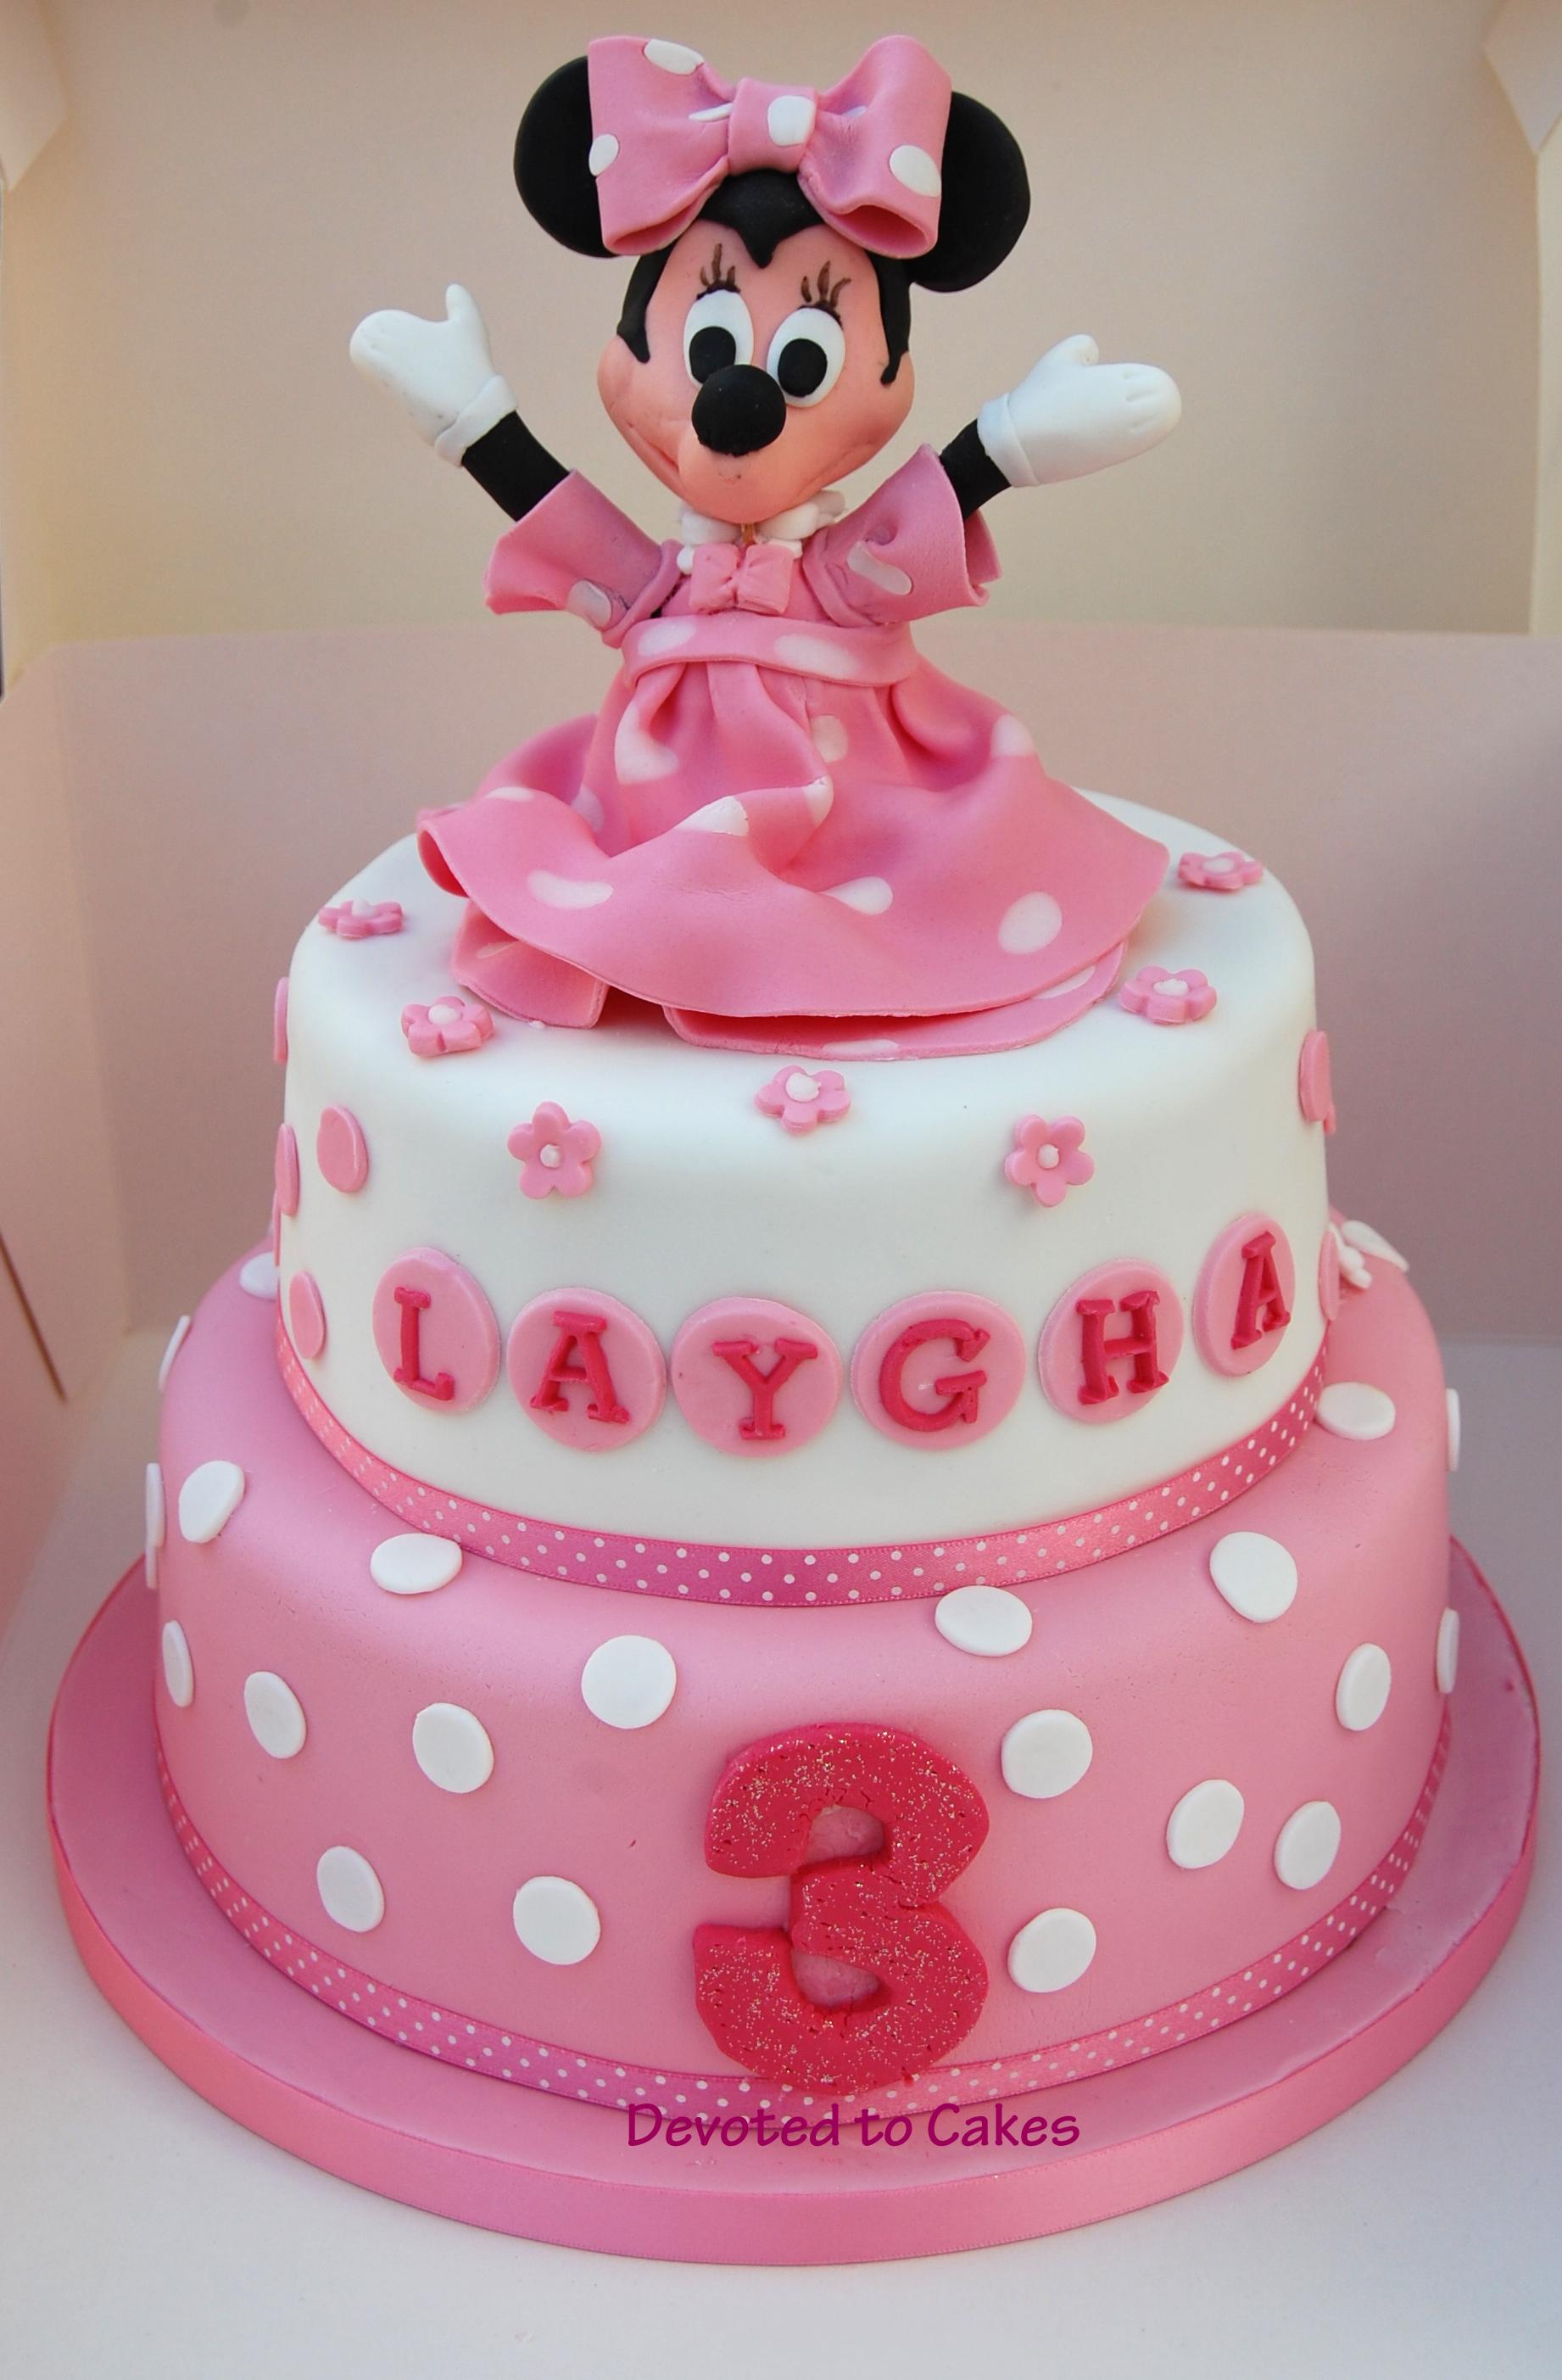 Cake Design Minnie : Devoted To Cakes